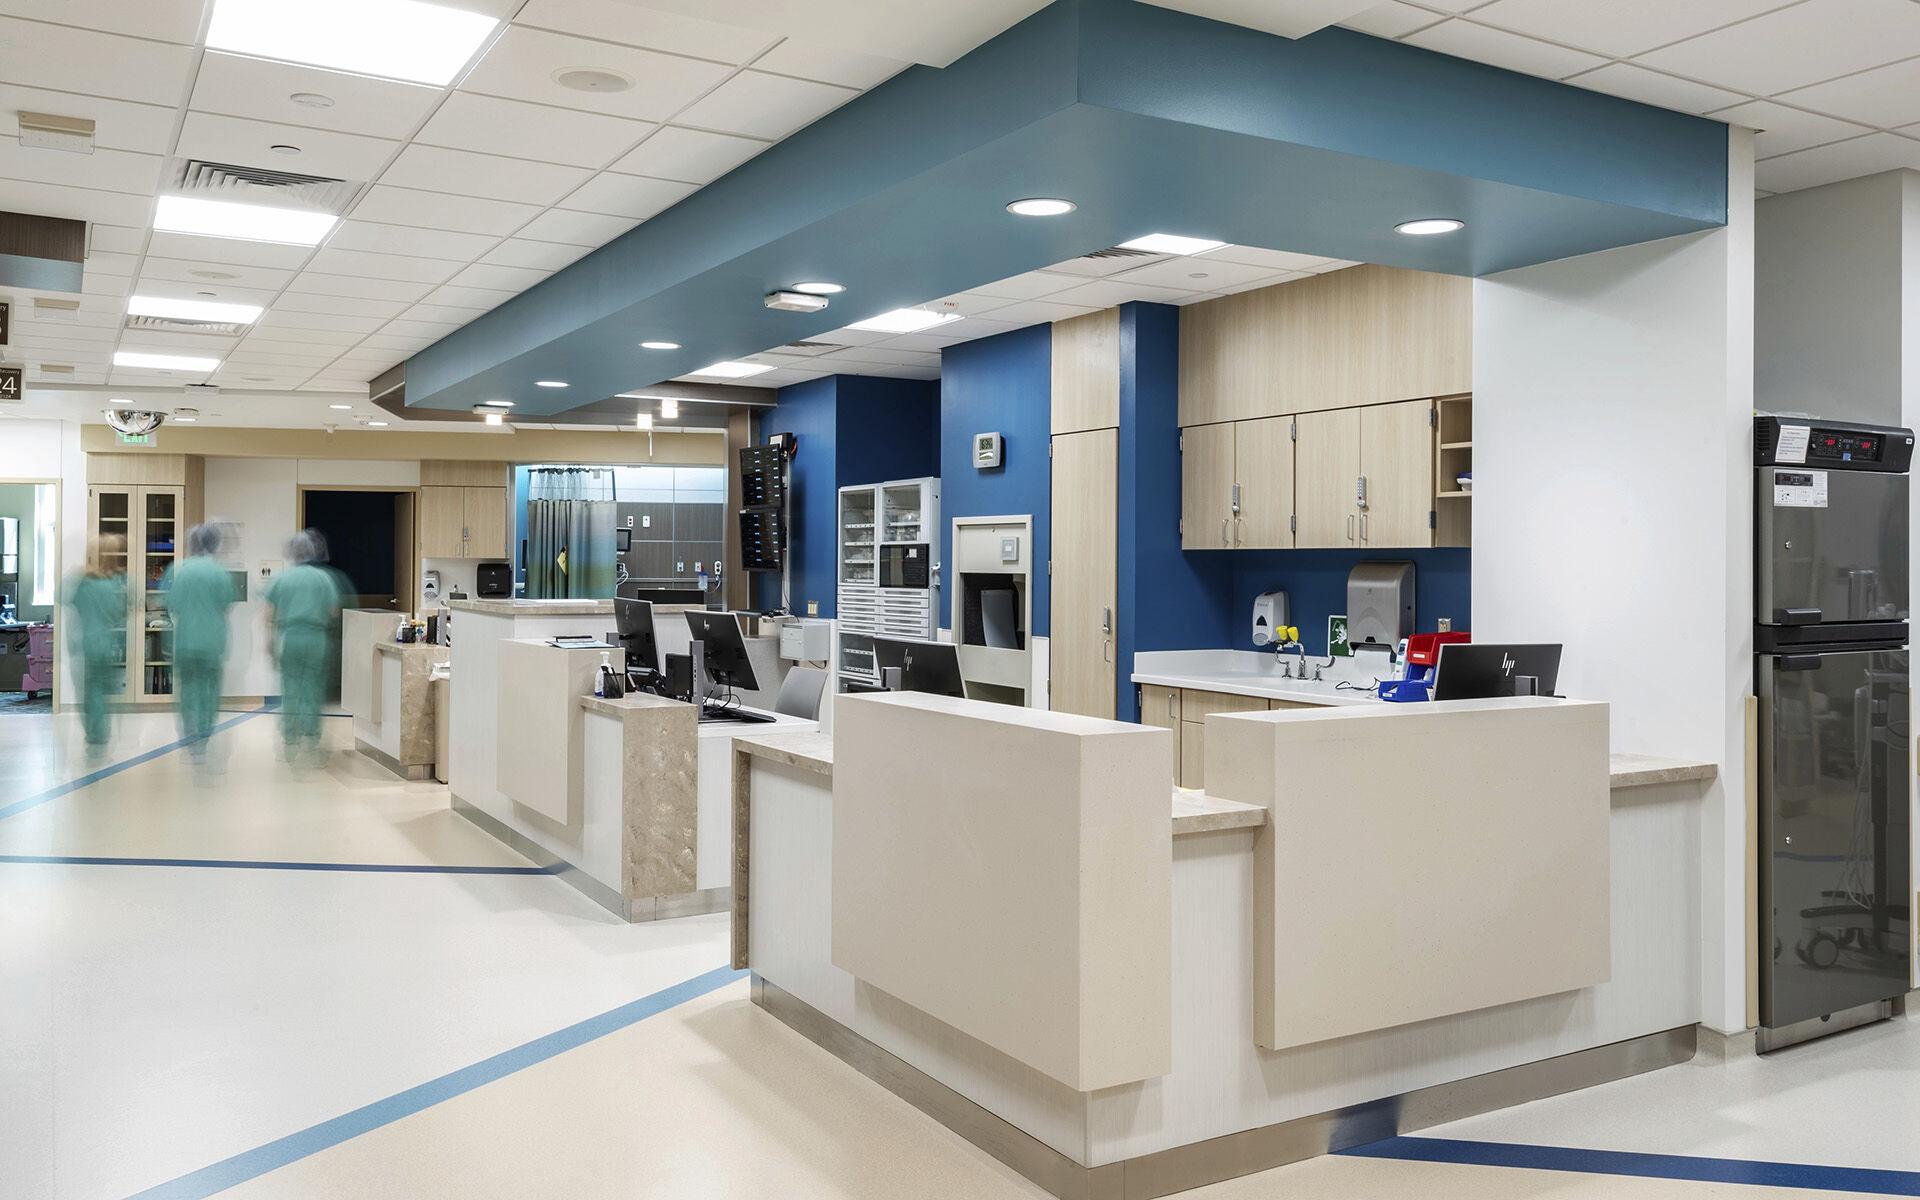 Indian Creek Campus Expansion - The University of Kansas Hospital